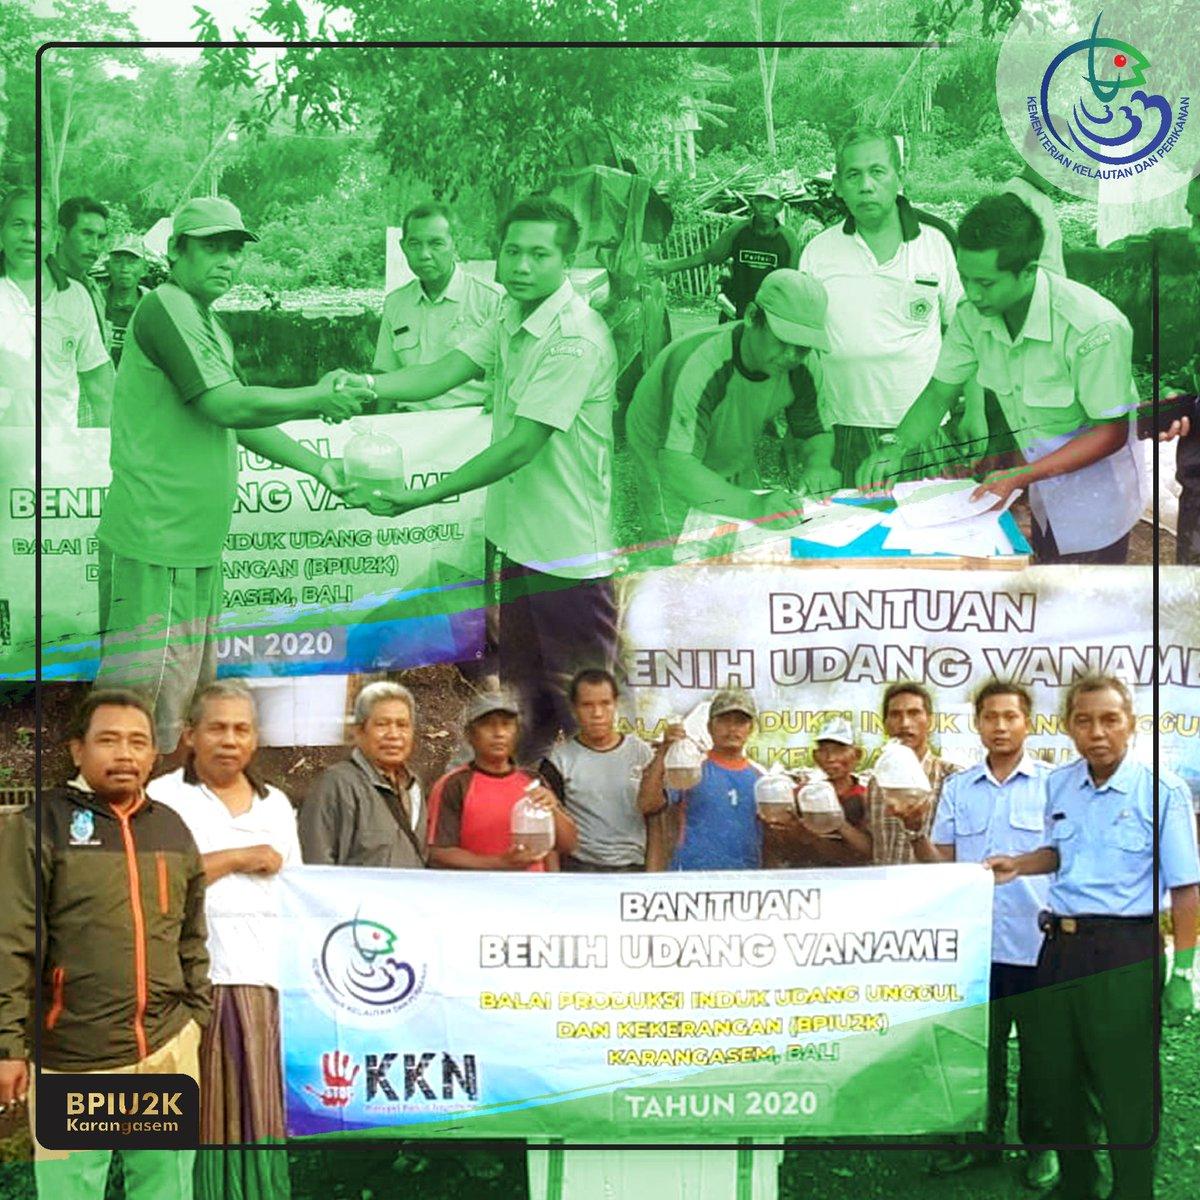 Bantuan pemerintah berupa 1 juta ekor benih udang vaname diberikan kepada pokdakan Raci 3 yang berlokasi di Desa Raci 3, Kec Bangil, Kab Pasuruan - Jawa Timur. Semoga bantuan yang diberikan bermanfaat. @Edhy_Prabowo  @s_soebjakto @BudidayaKKPpic.twitter.com/kXH51gmoIt